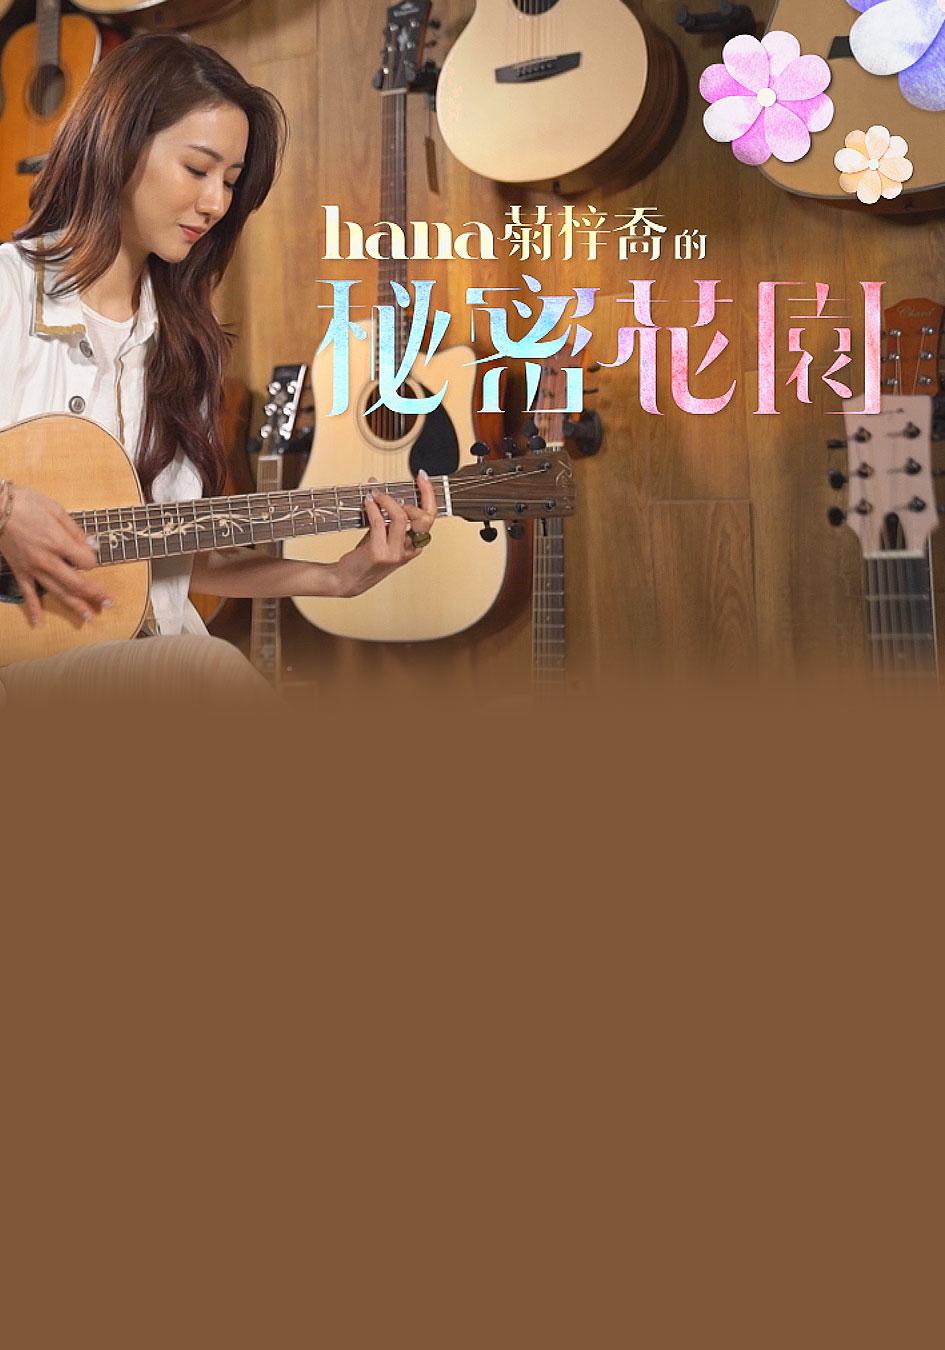 Hana菊梓喬的秘密花園-Hana Kuk Special